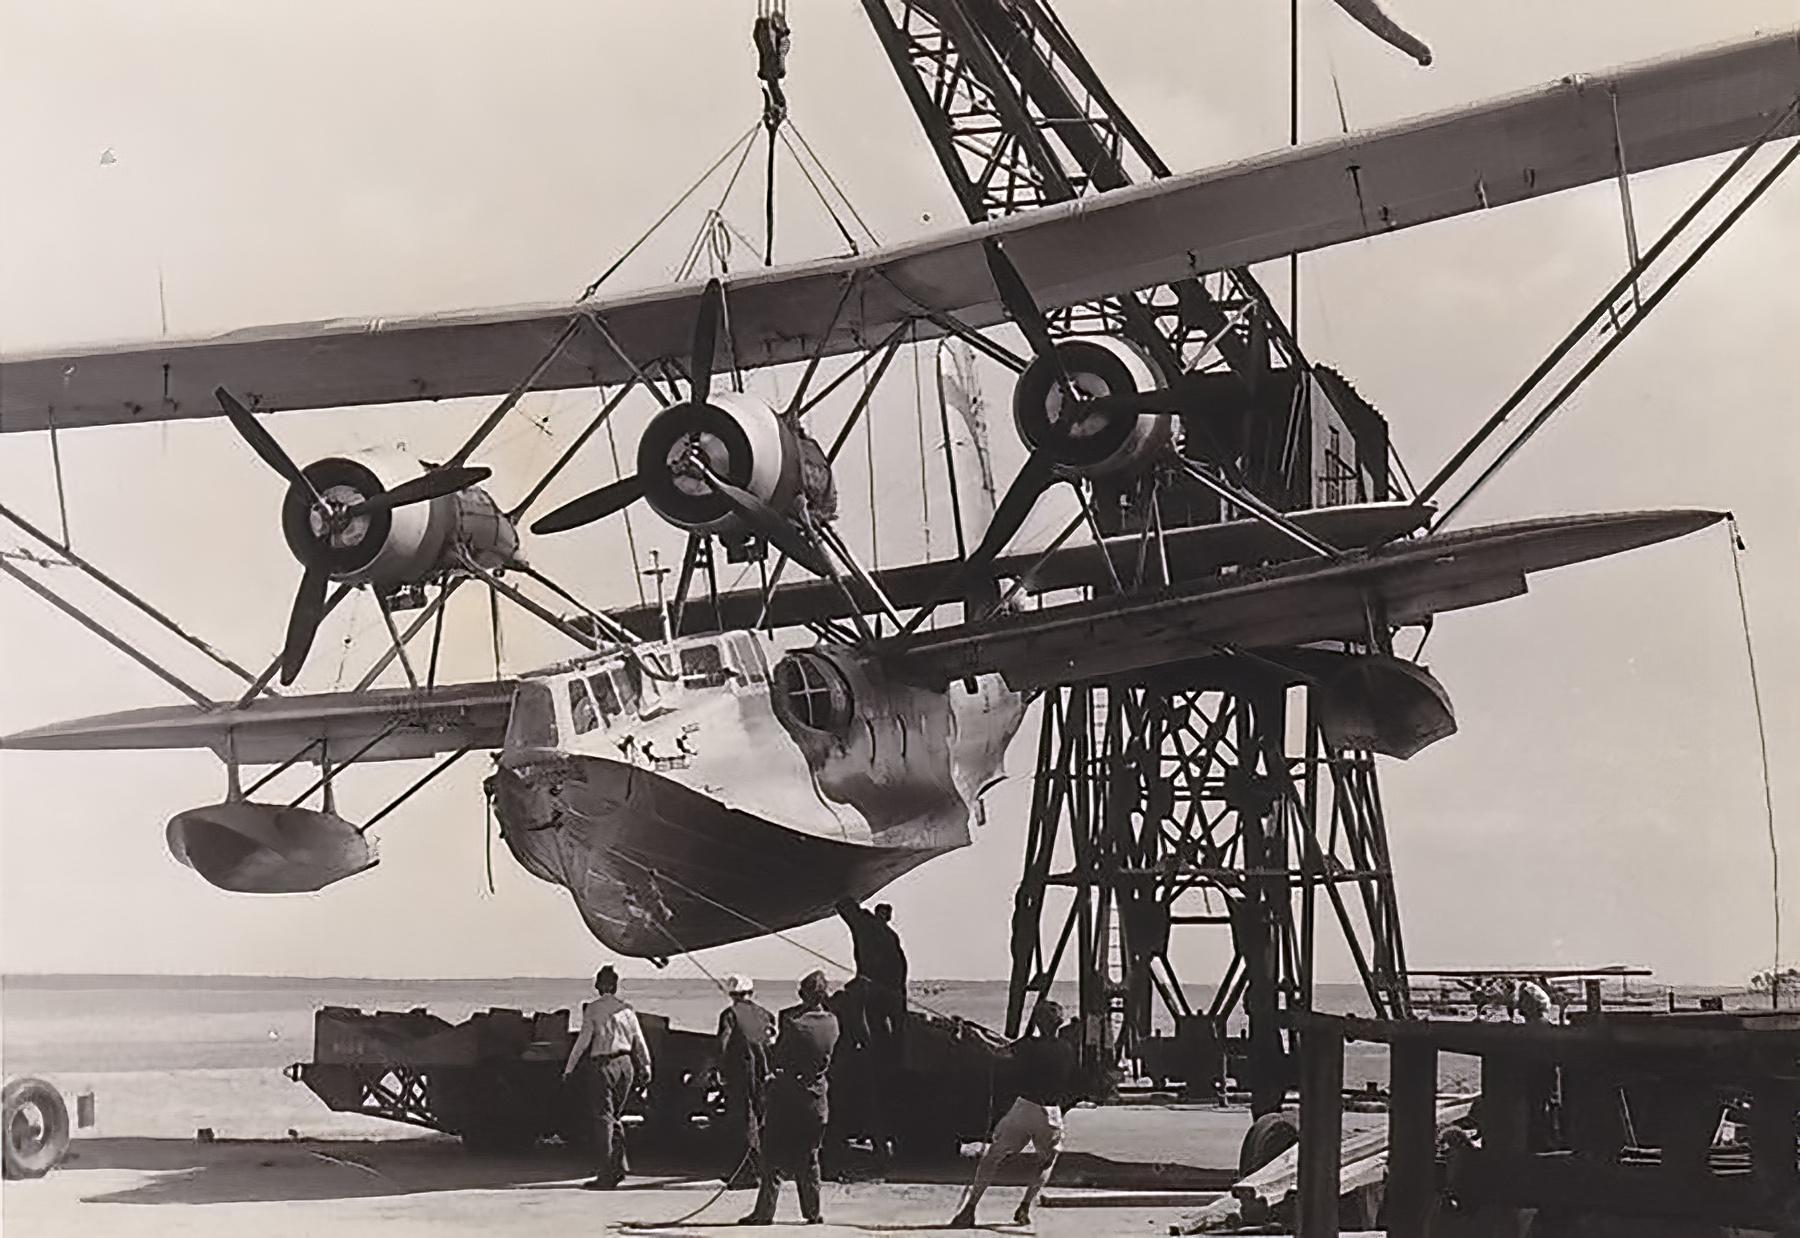 Luftwaffe Seenotdienst Breguet Bre 521 based at Brest after the fall of June France 1940 ebay 02